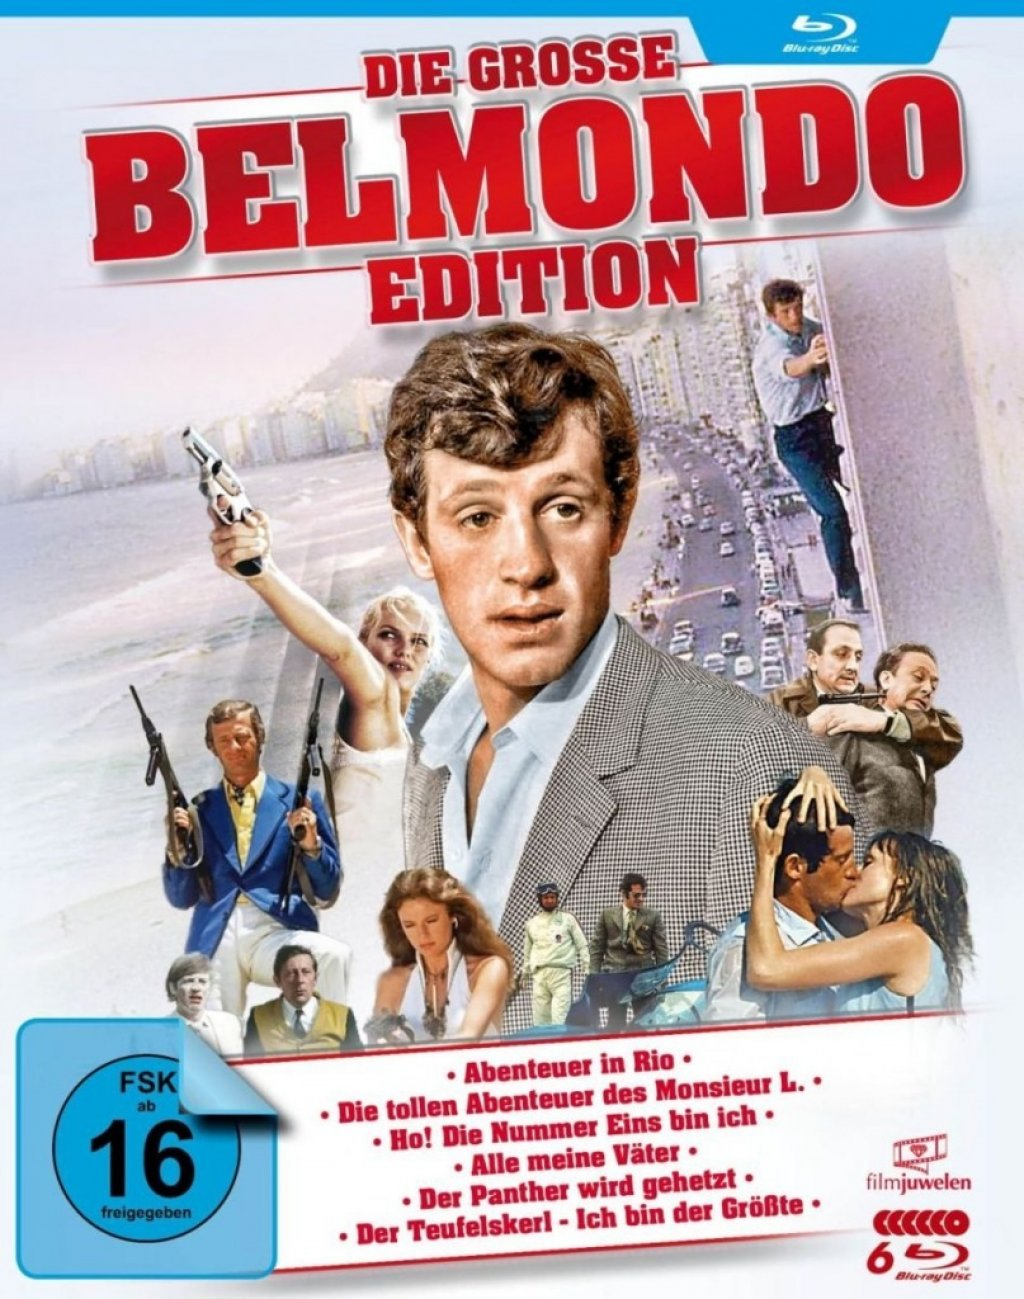 Die grosse Belmondo-Edition (Blu-ray)